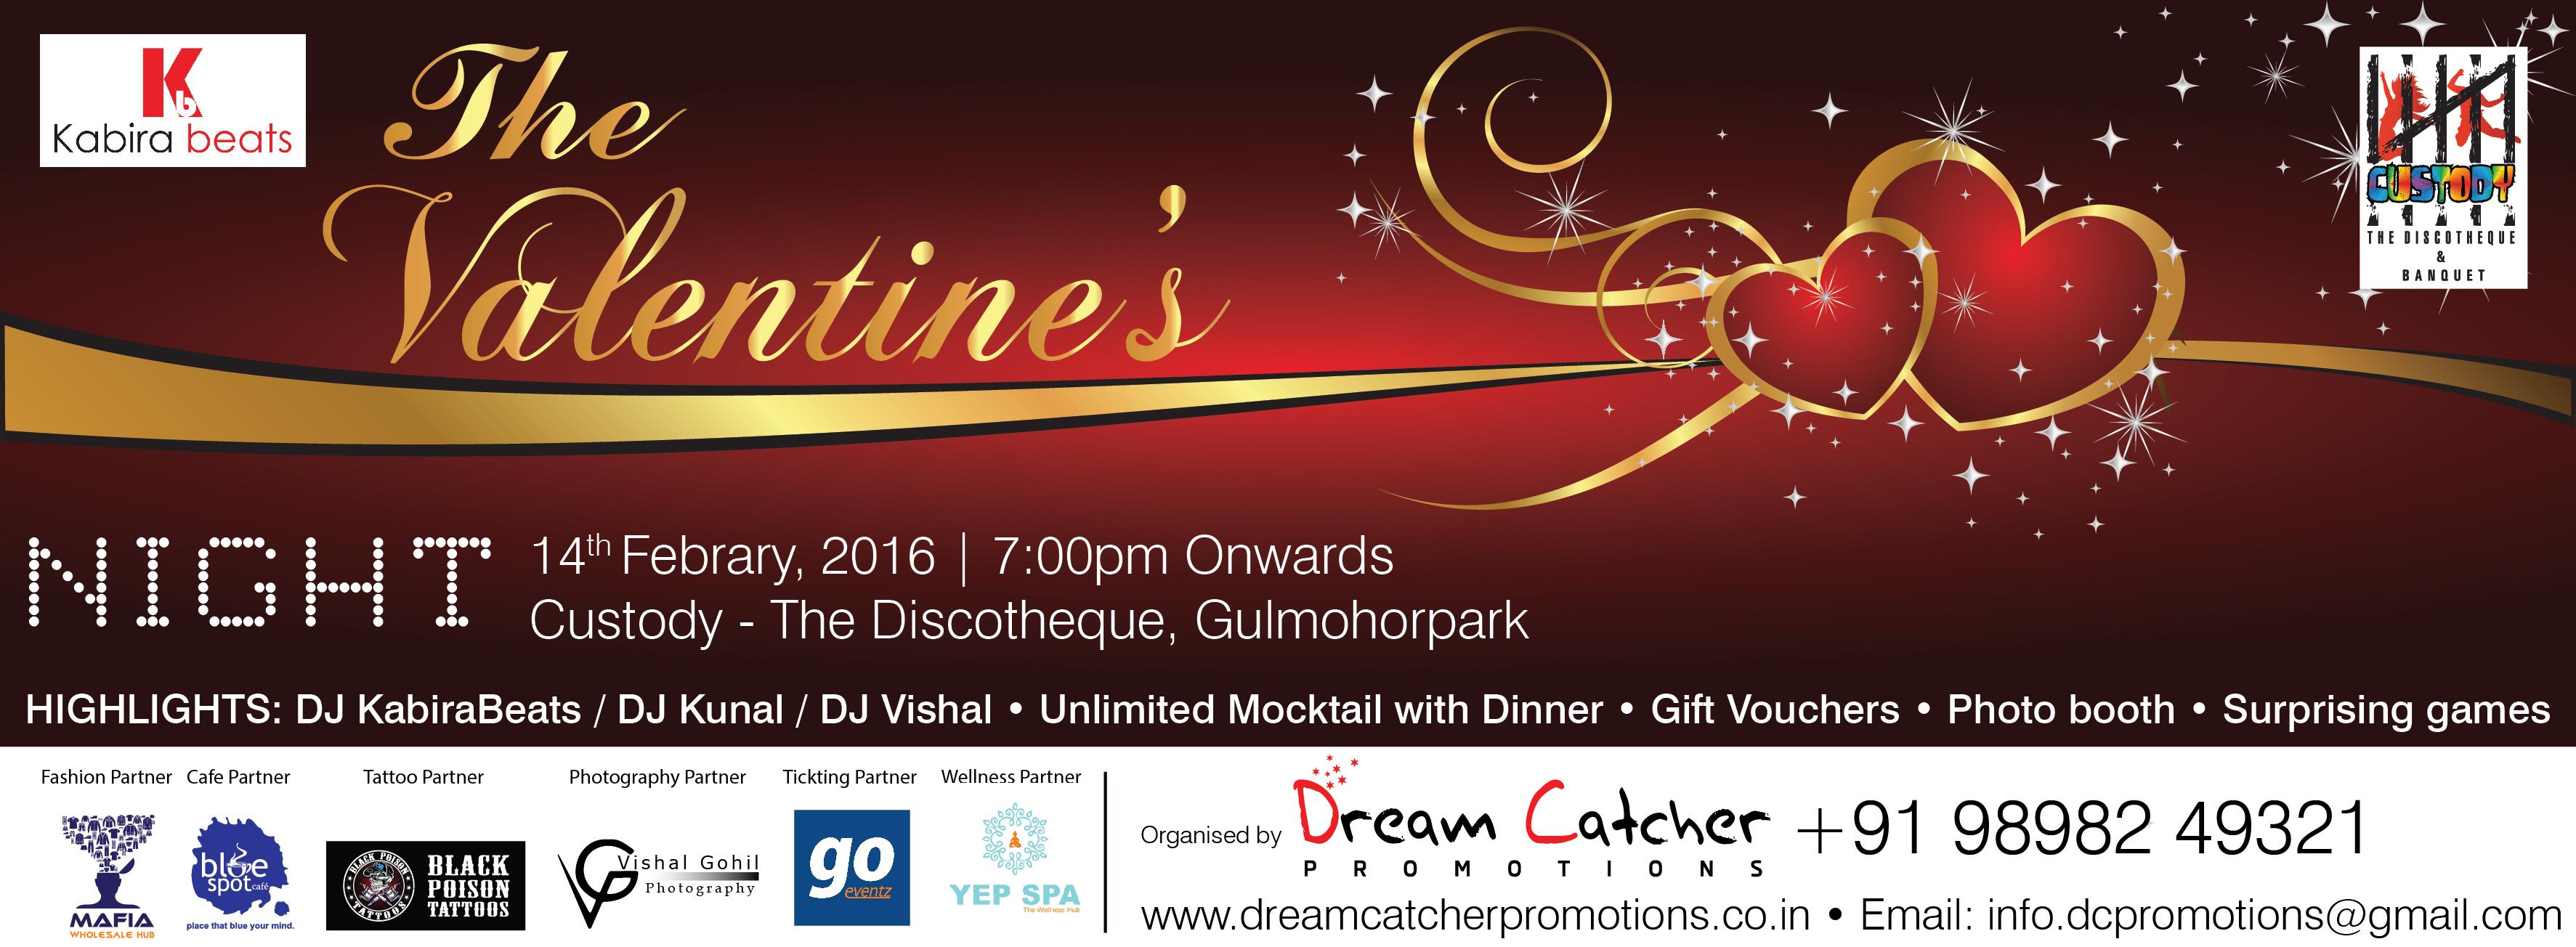 The Valentines Night